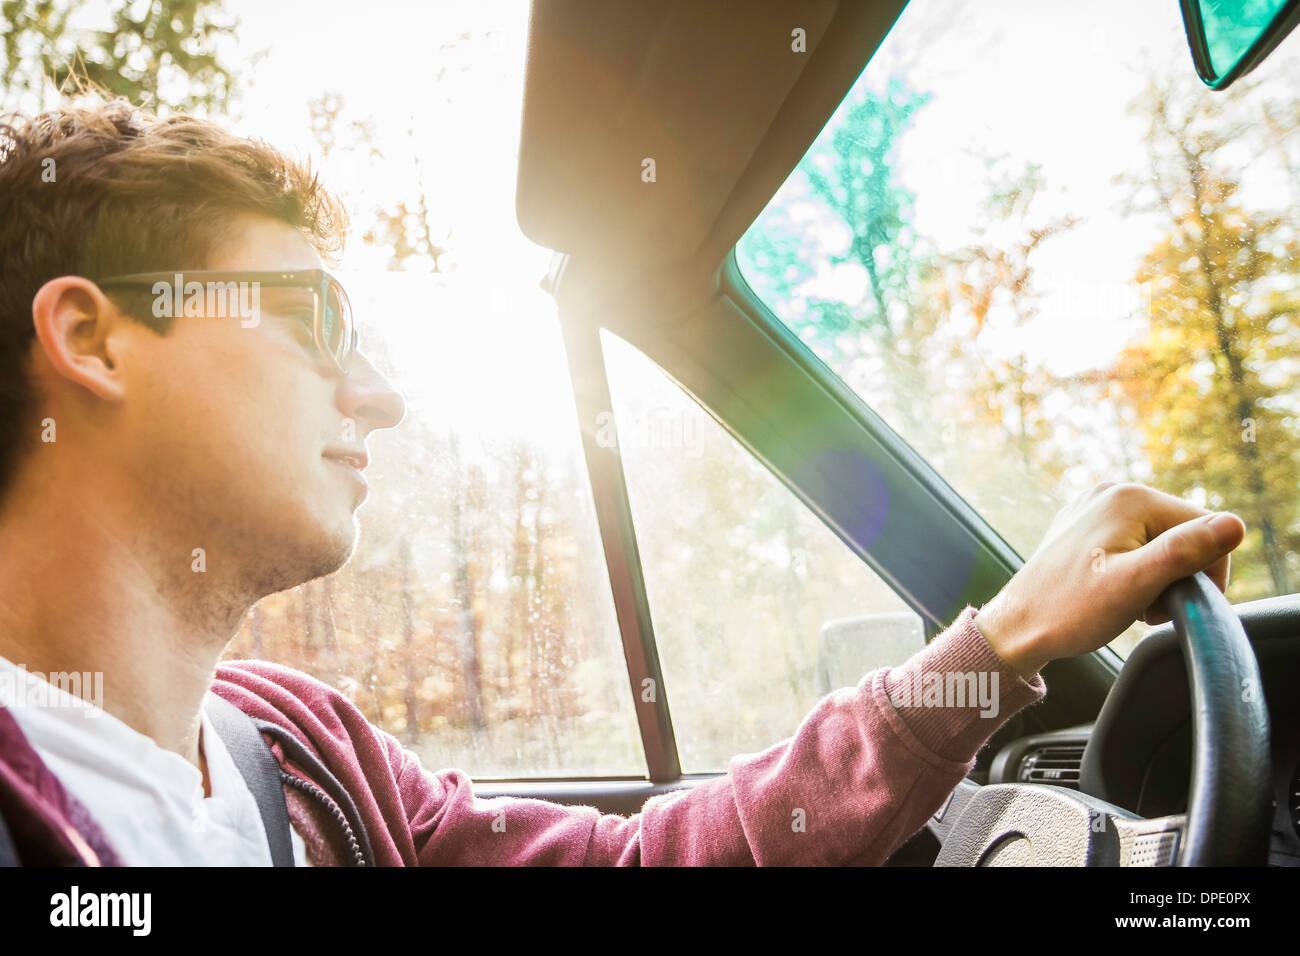 Joven conducción inclinada convertible en Country Road Imagen De Stock